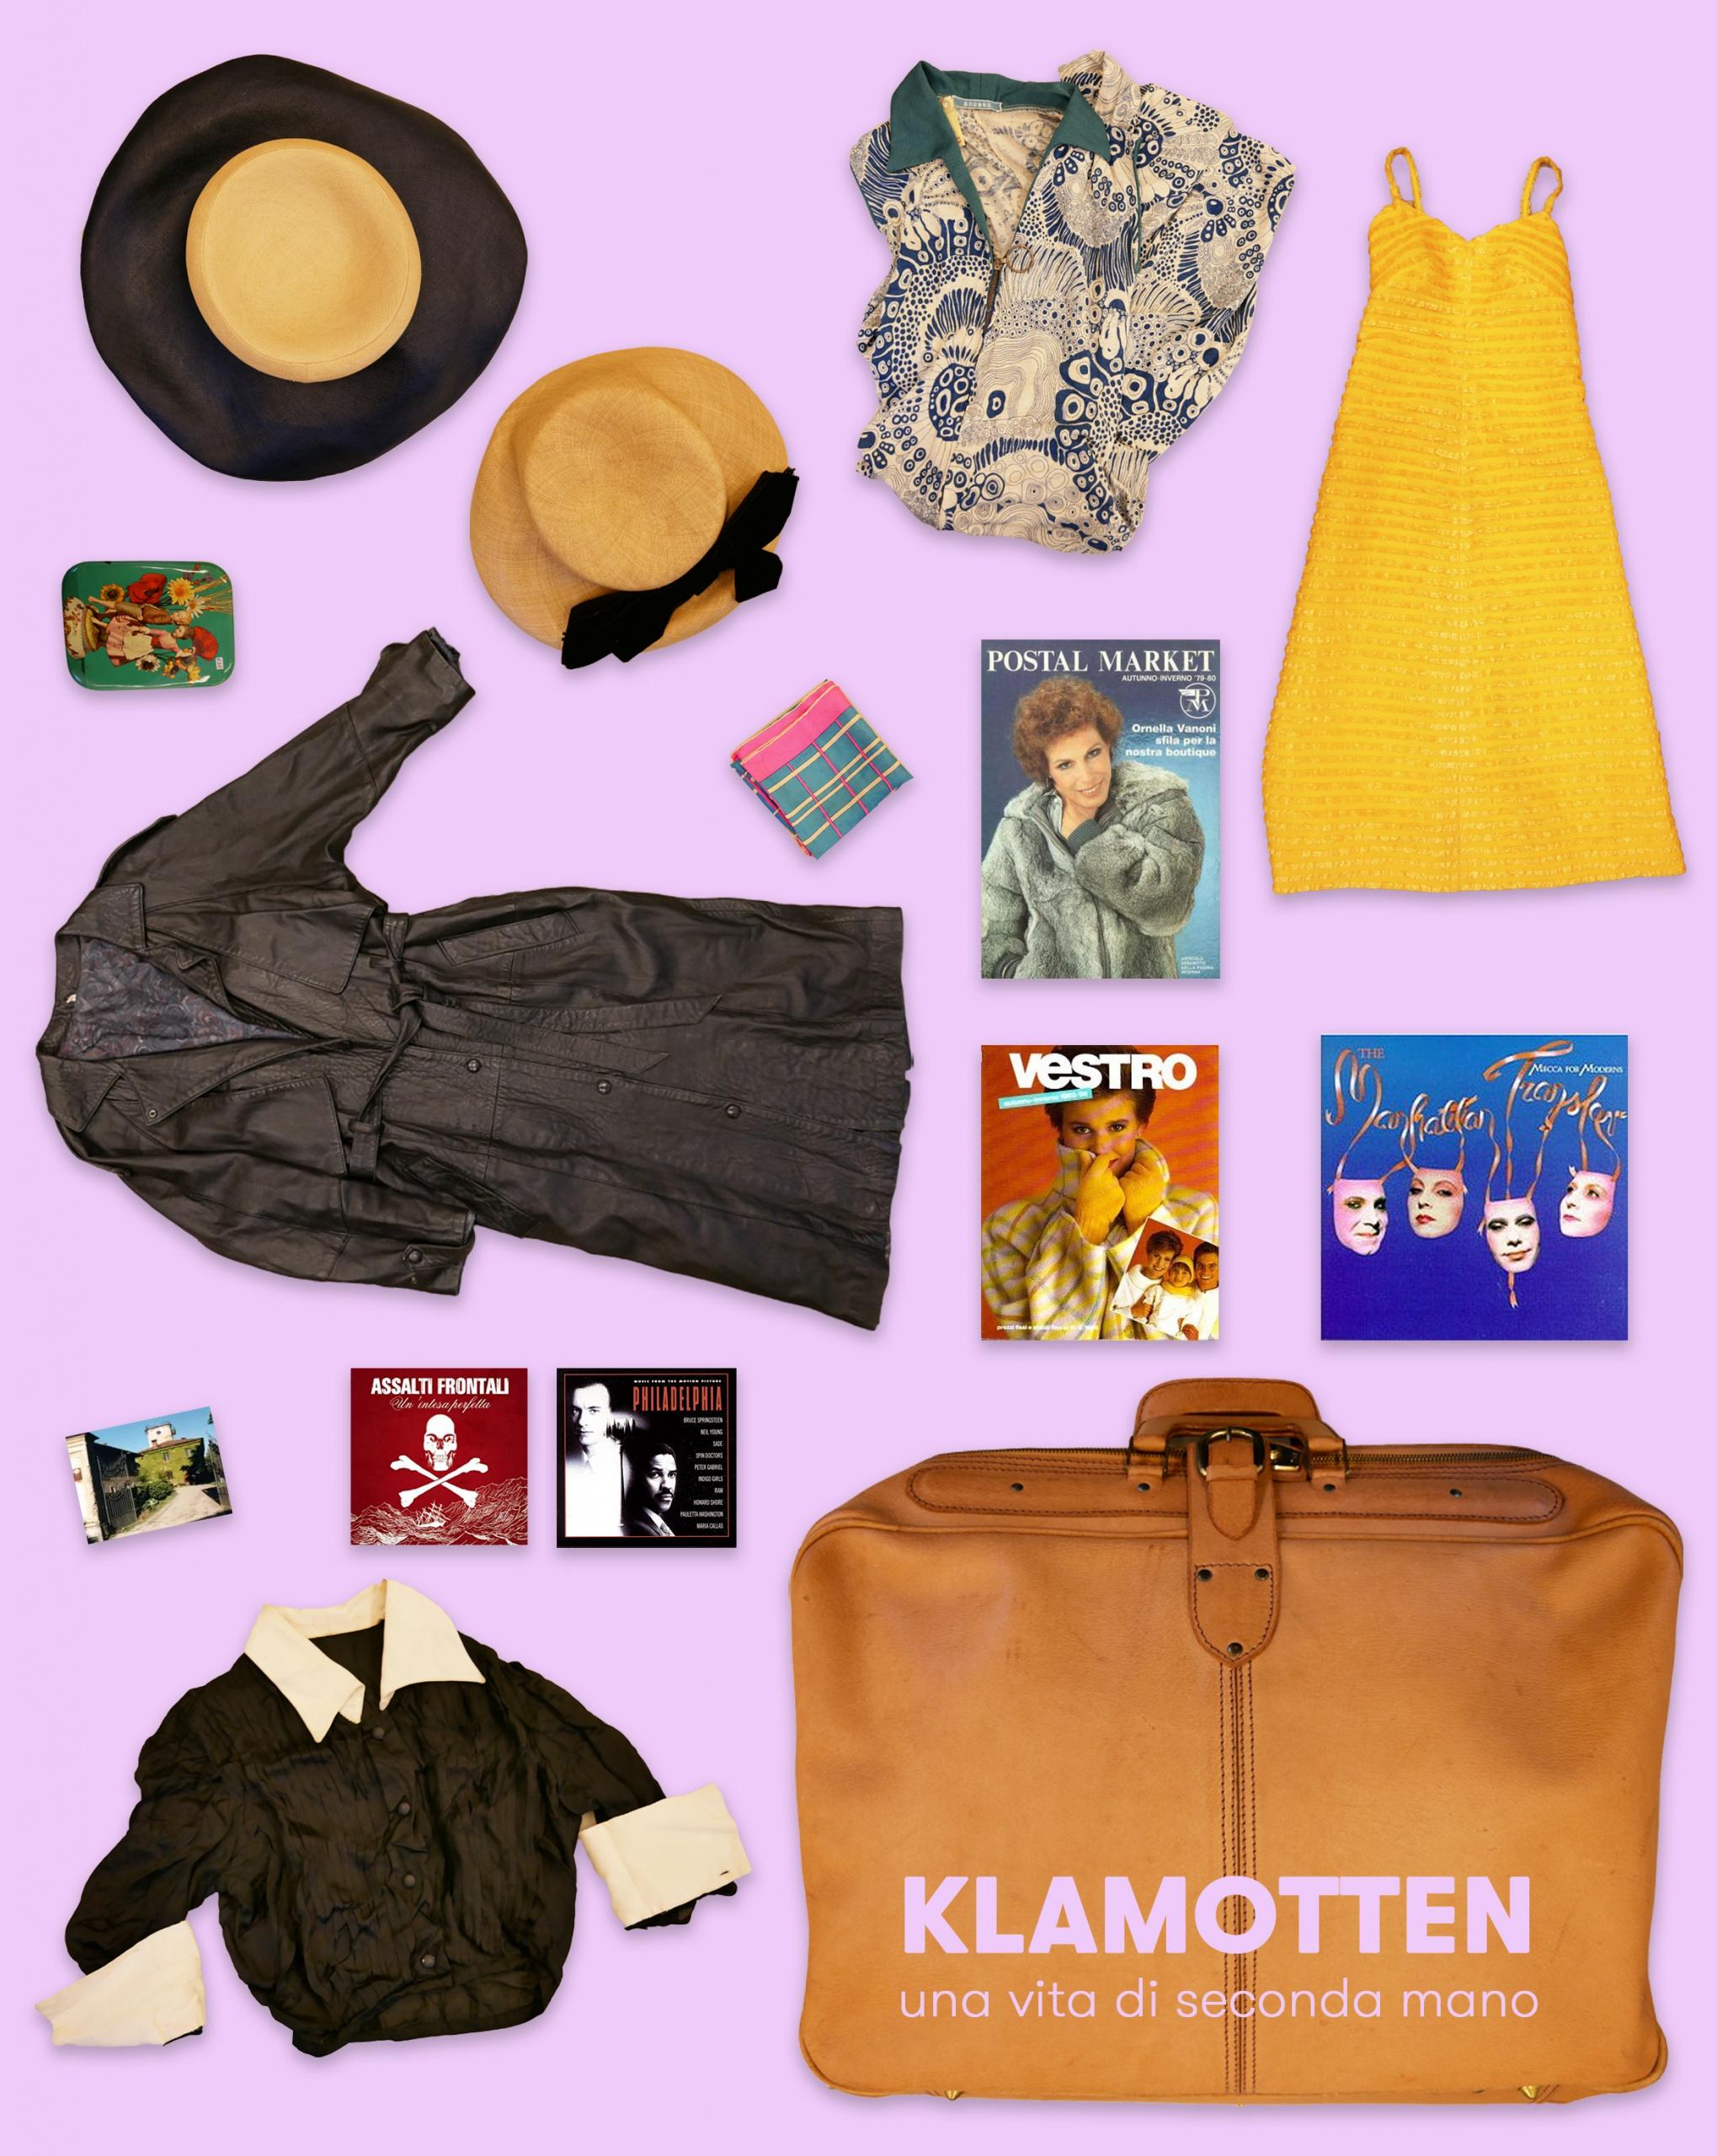 Klamotten  - Una vita di seconda mano